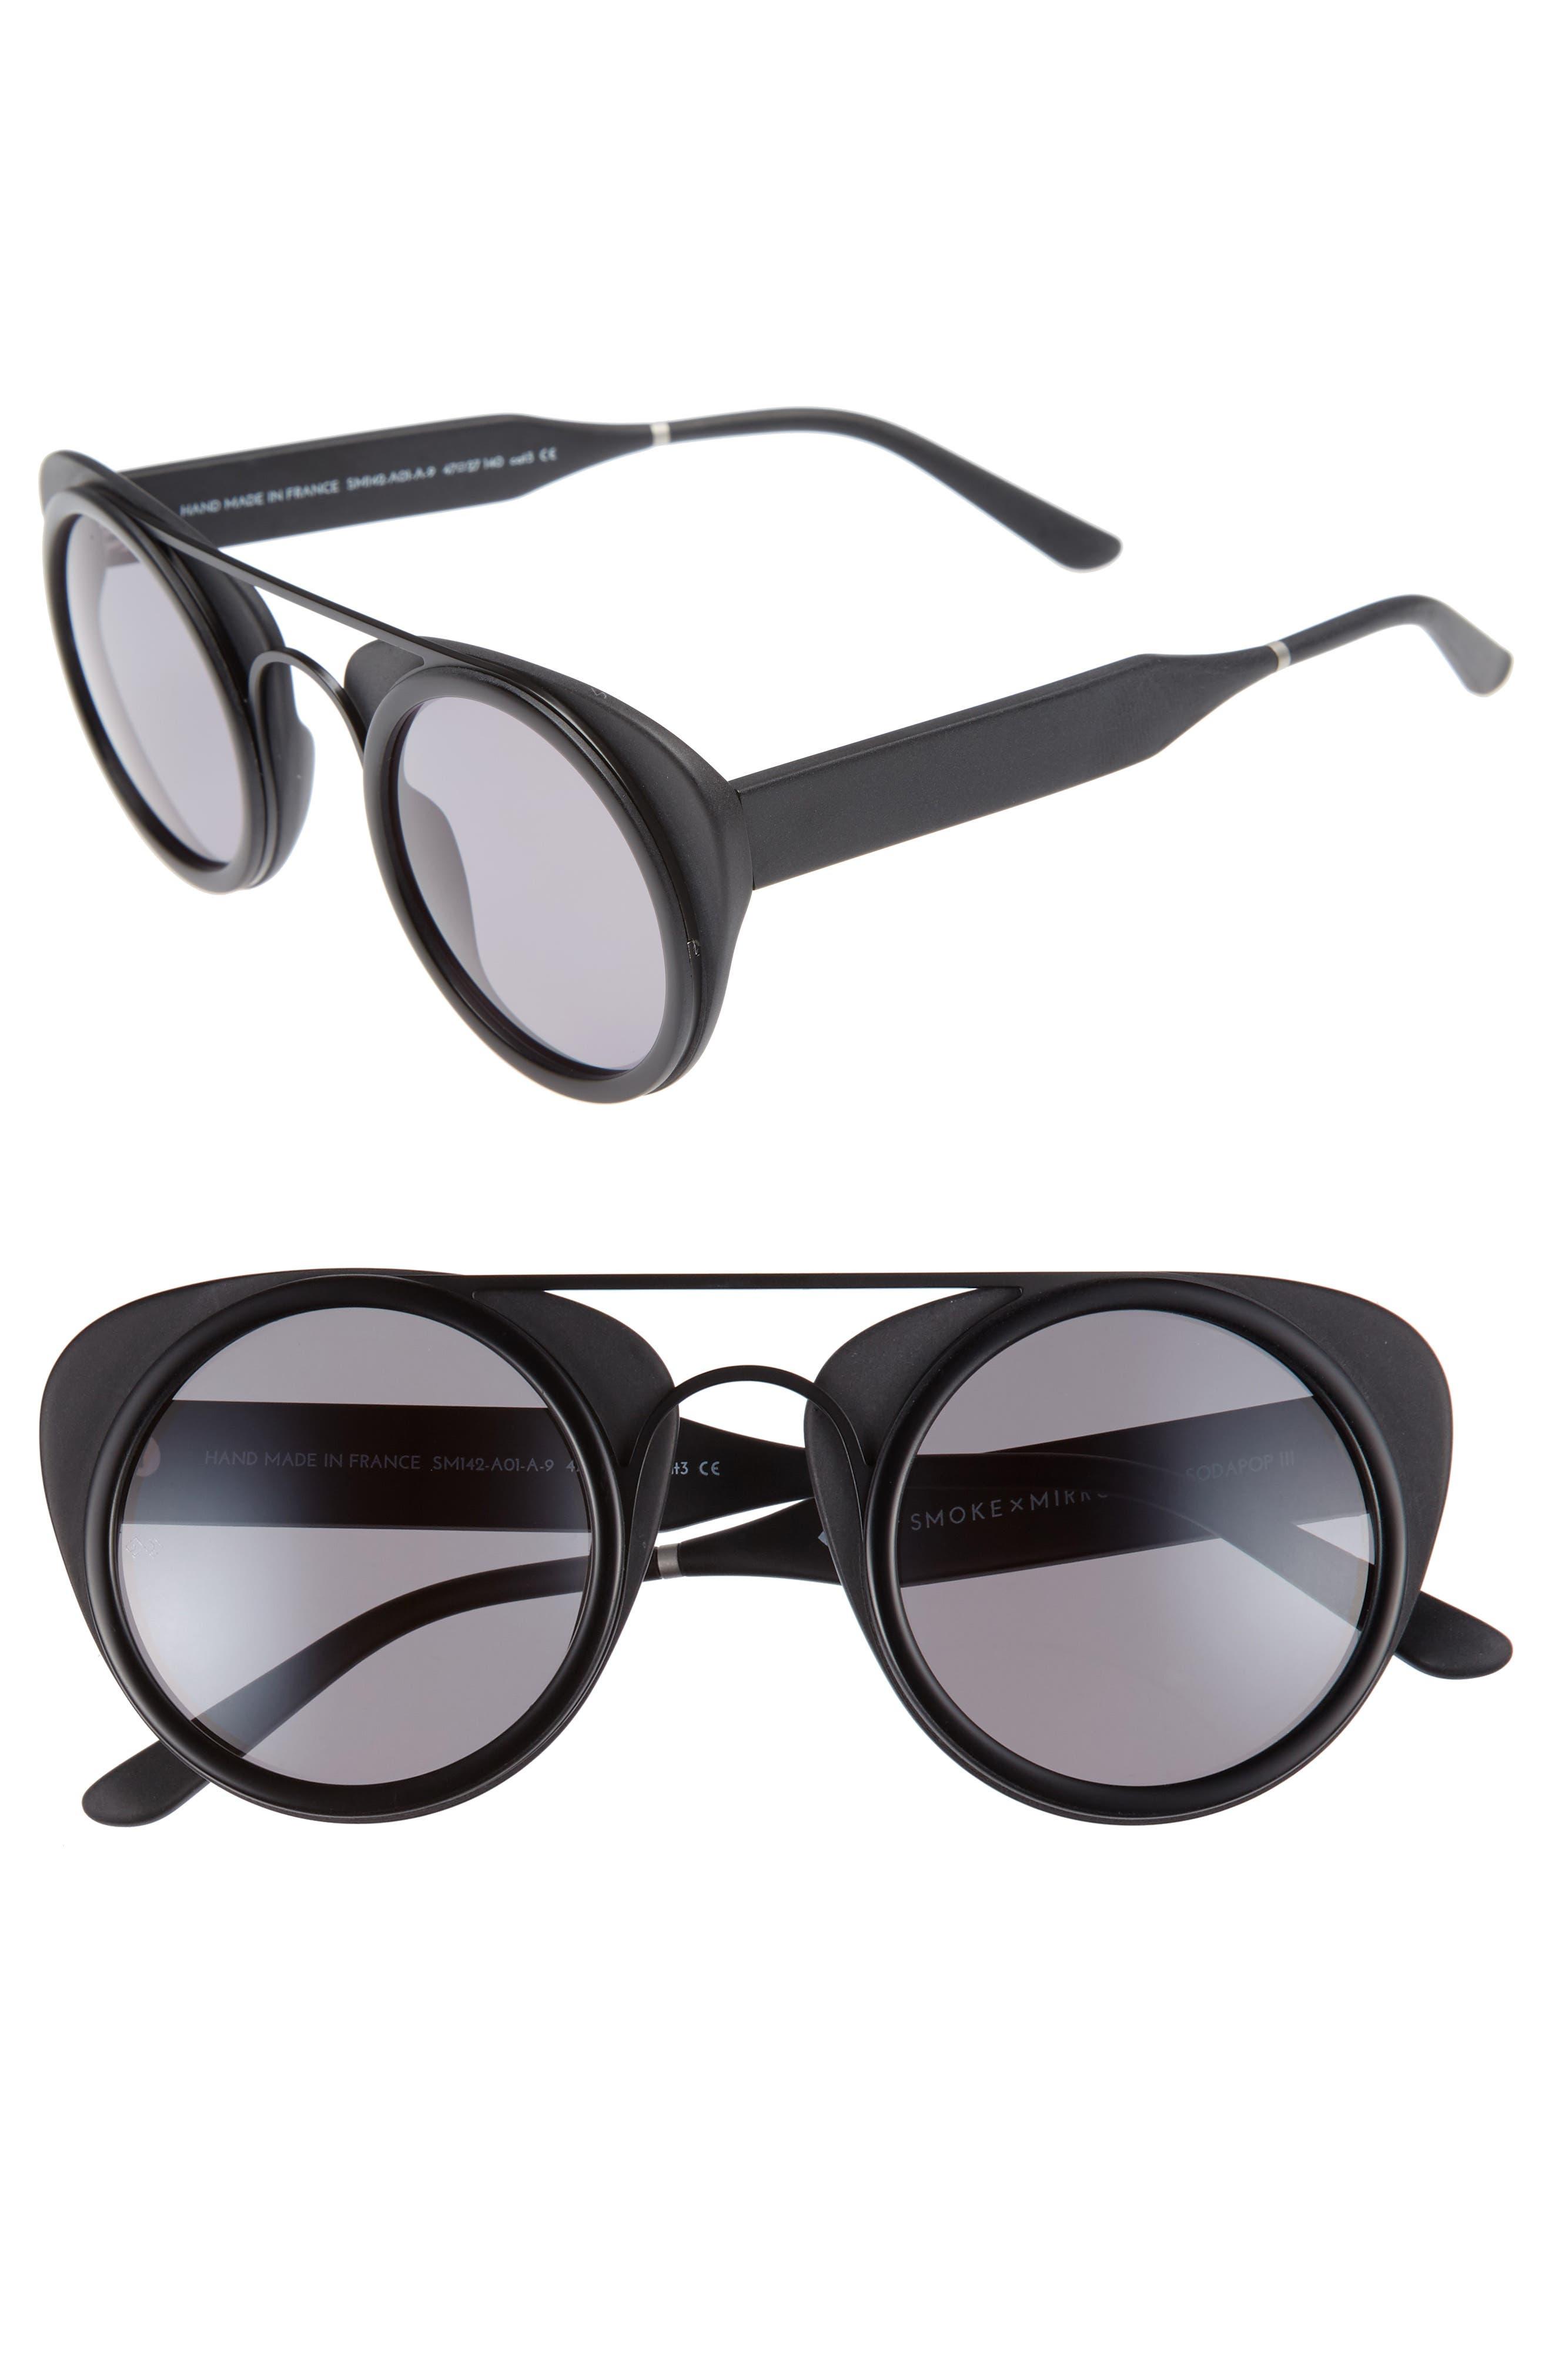 Soda Pop 3 47mm Retro Sunglasses,                         Main,                         color, 001